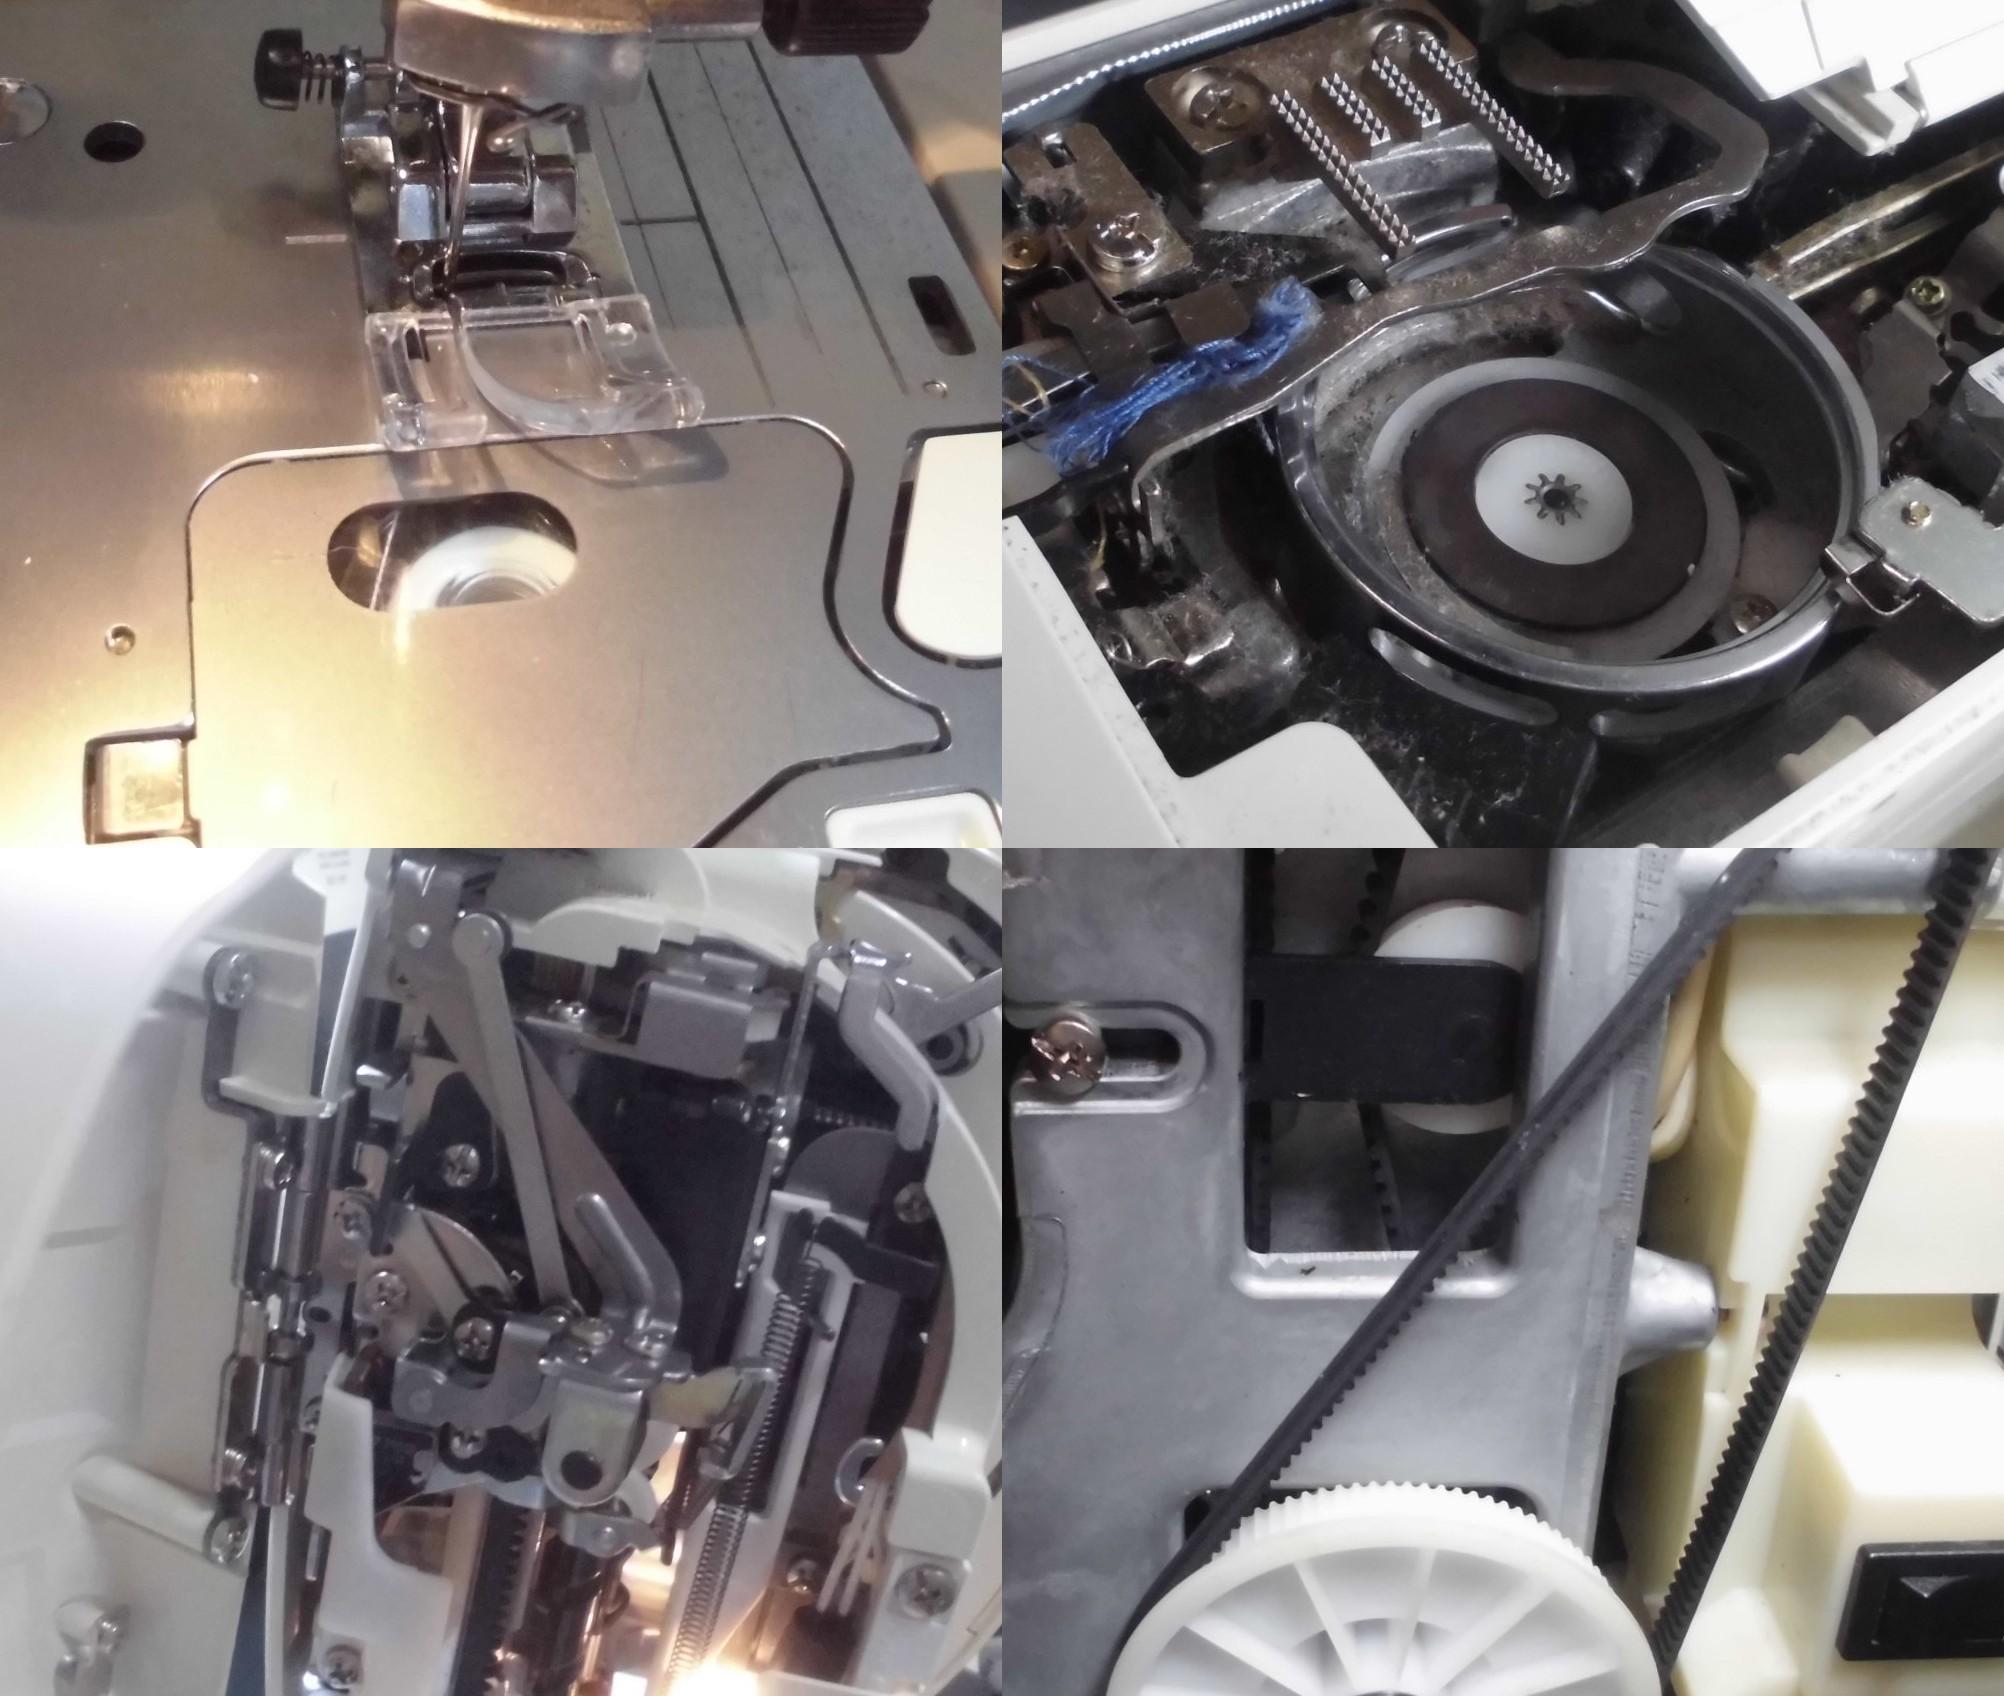 JUREVE HZL-010の全体メンテナンス 清掃、整備、点検、調整